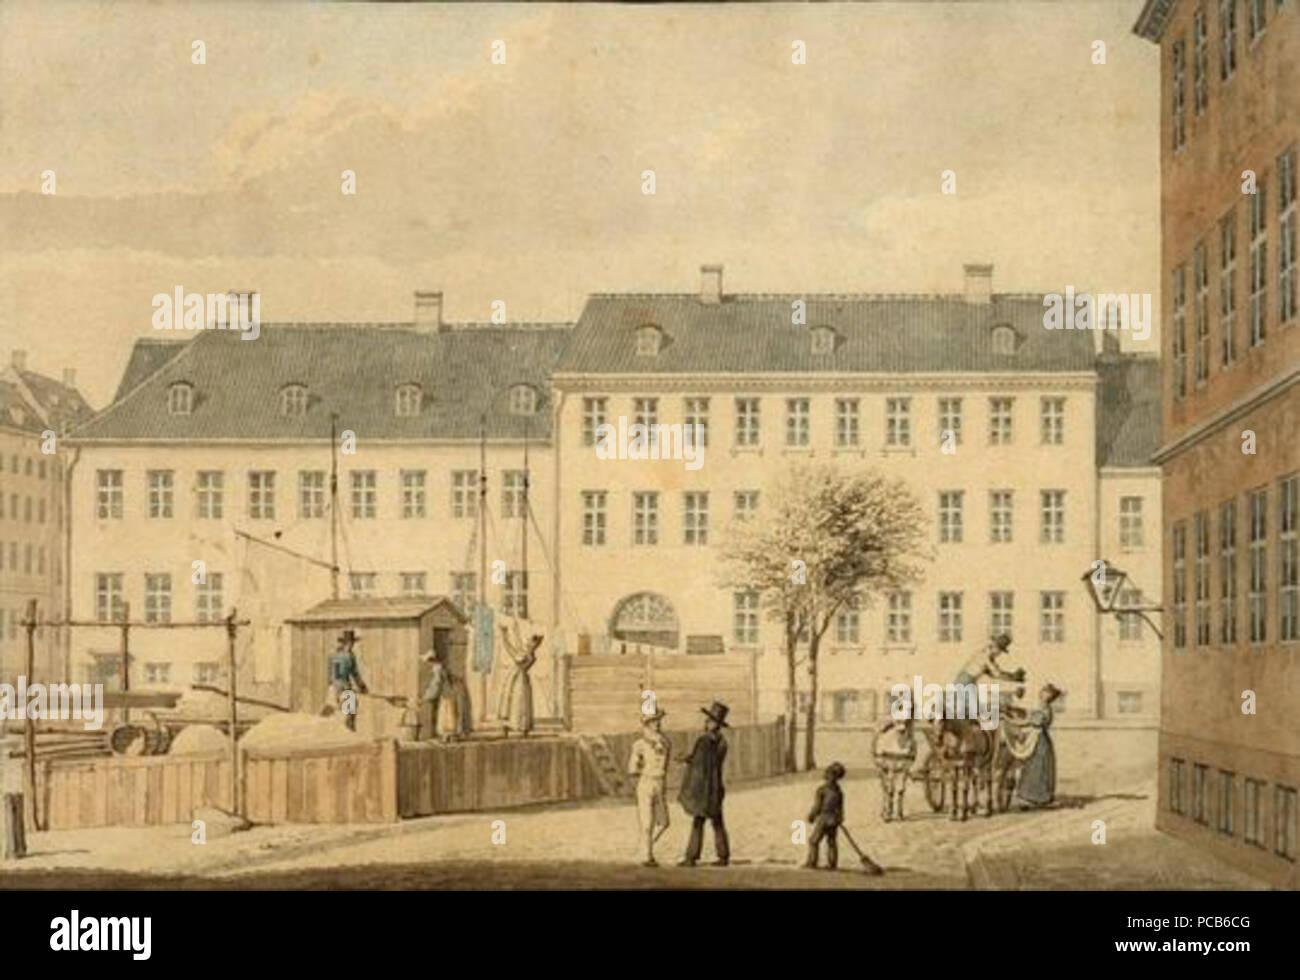 262 H. G. F. Holm - Frederiksholms Kanal, 1835 - Stock Image